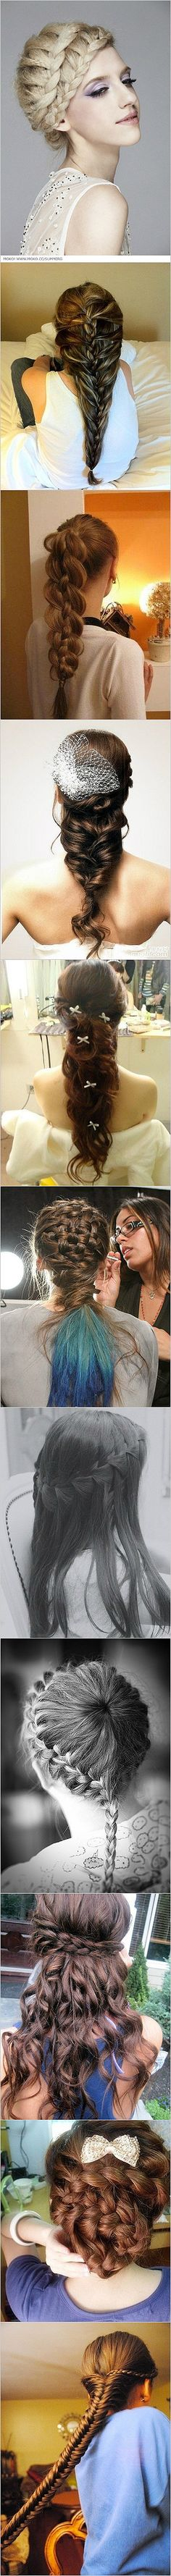 "creative hair styles => SOURCE: @Bendrix ""Hair and Style .ME"" Board via."